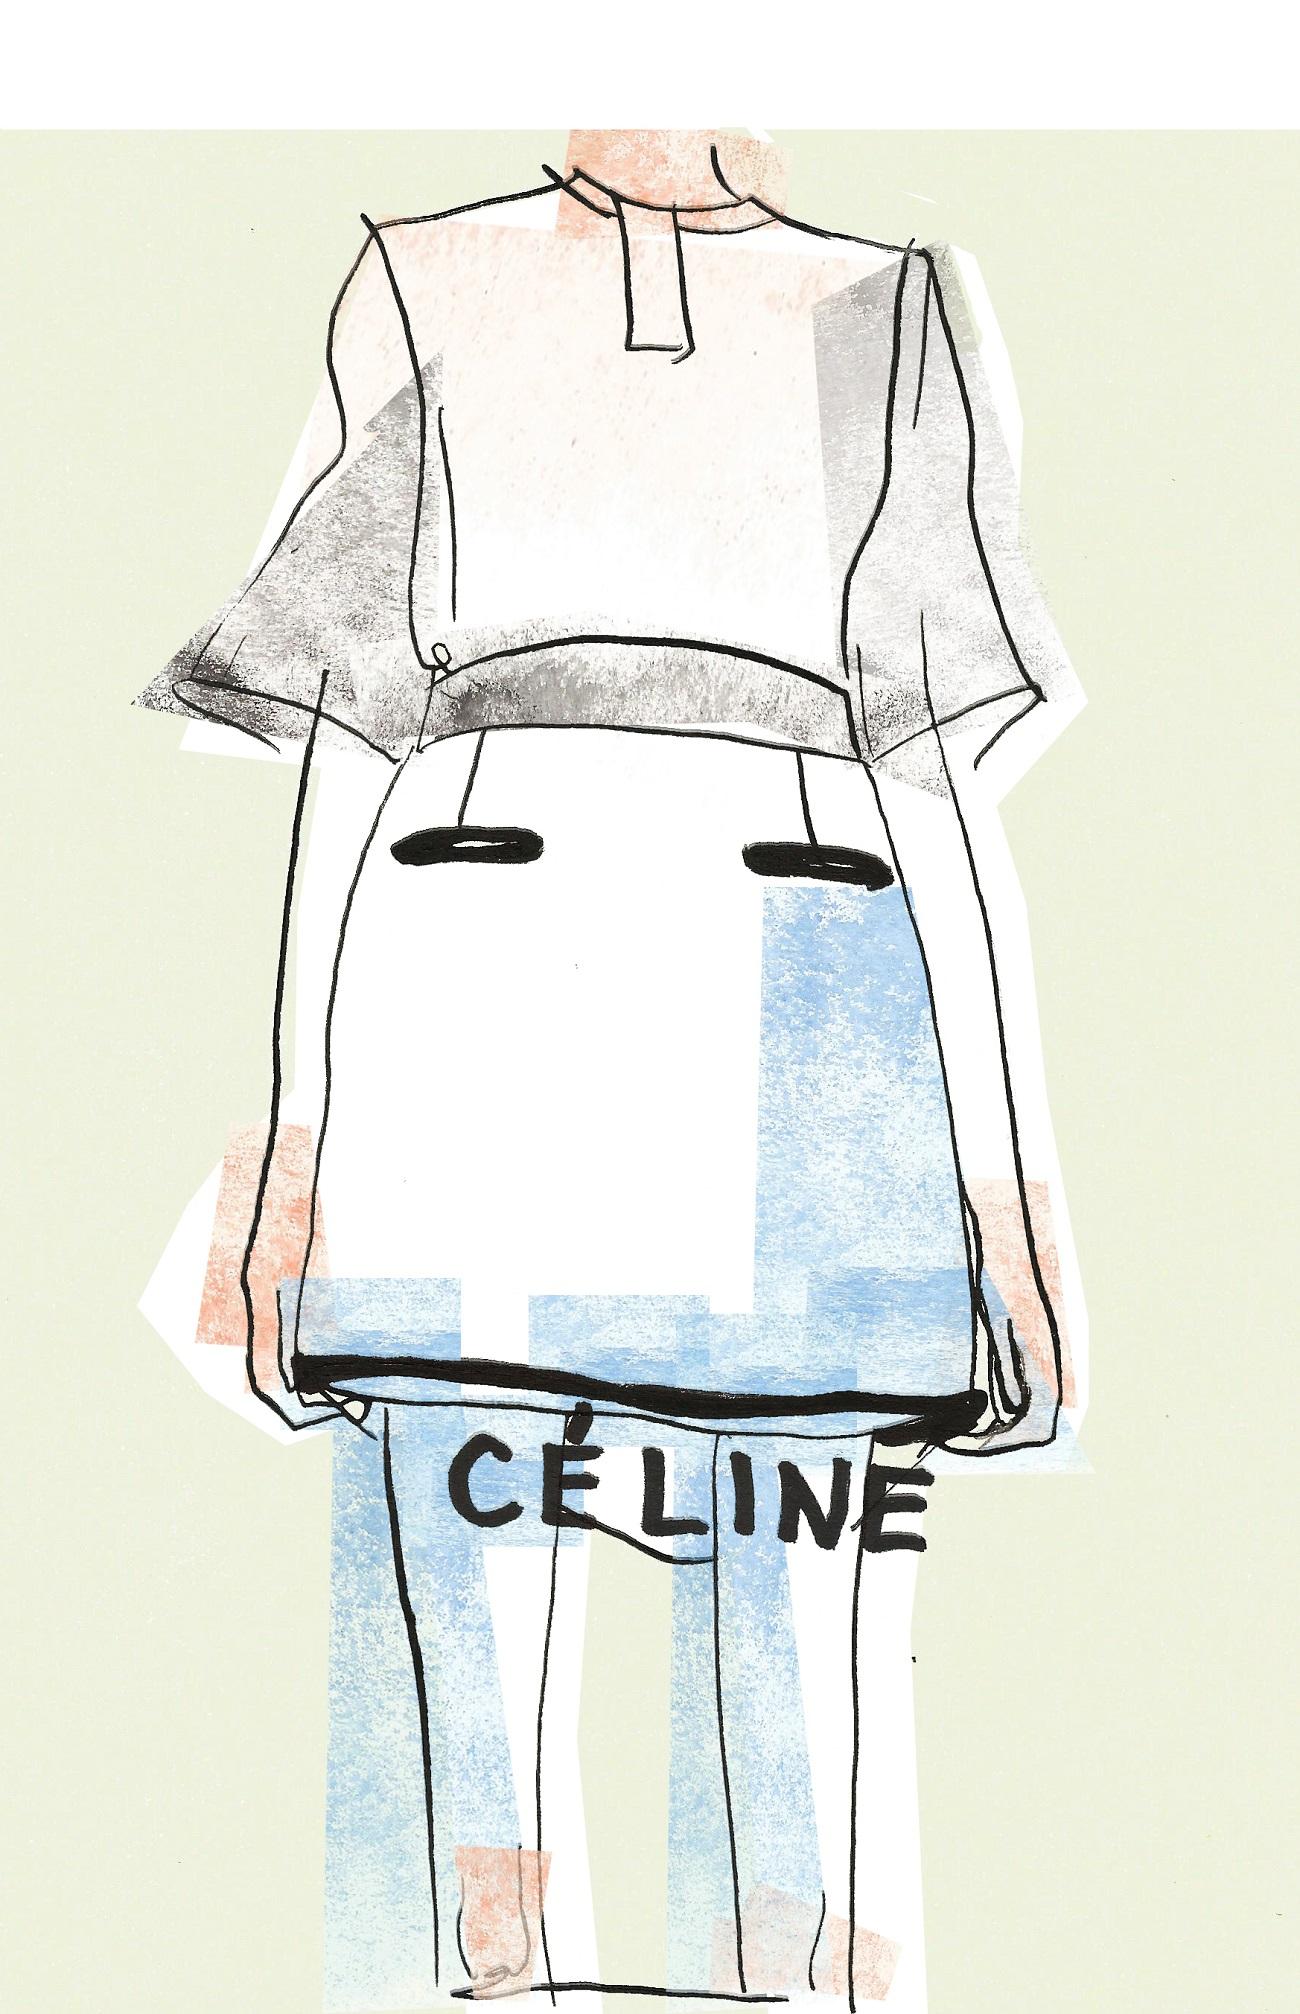 6. kép: Céline